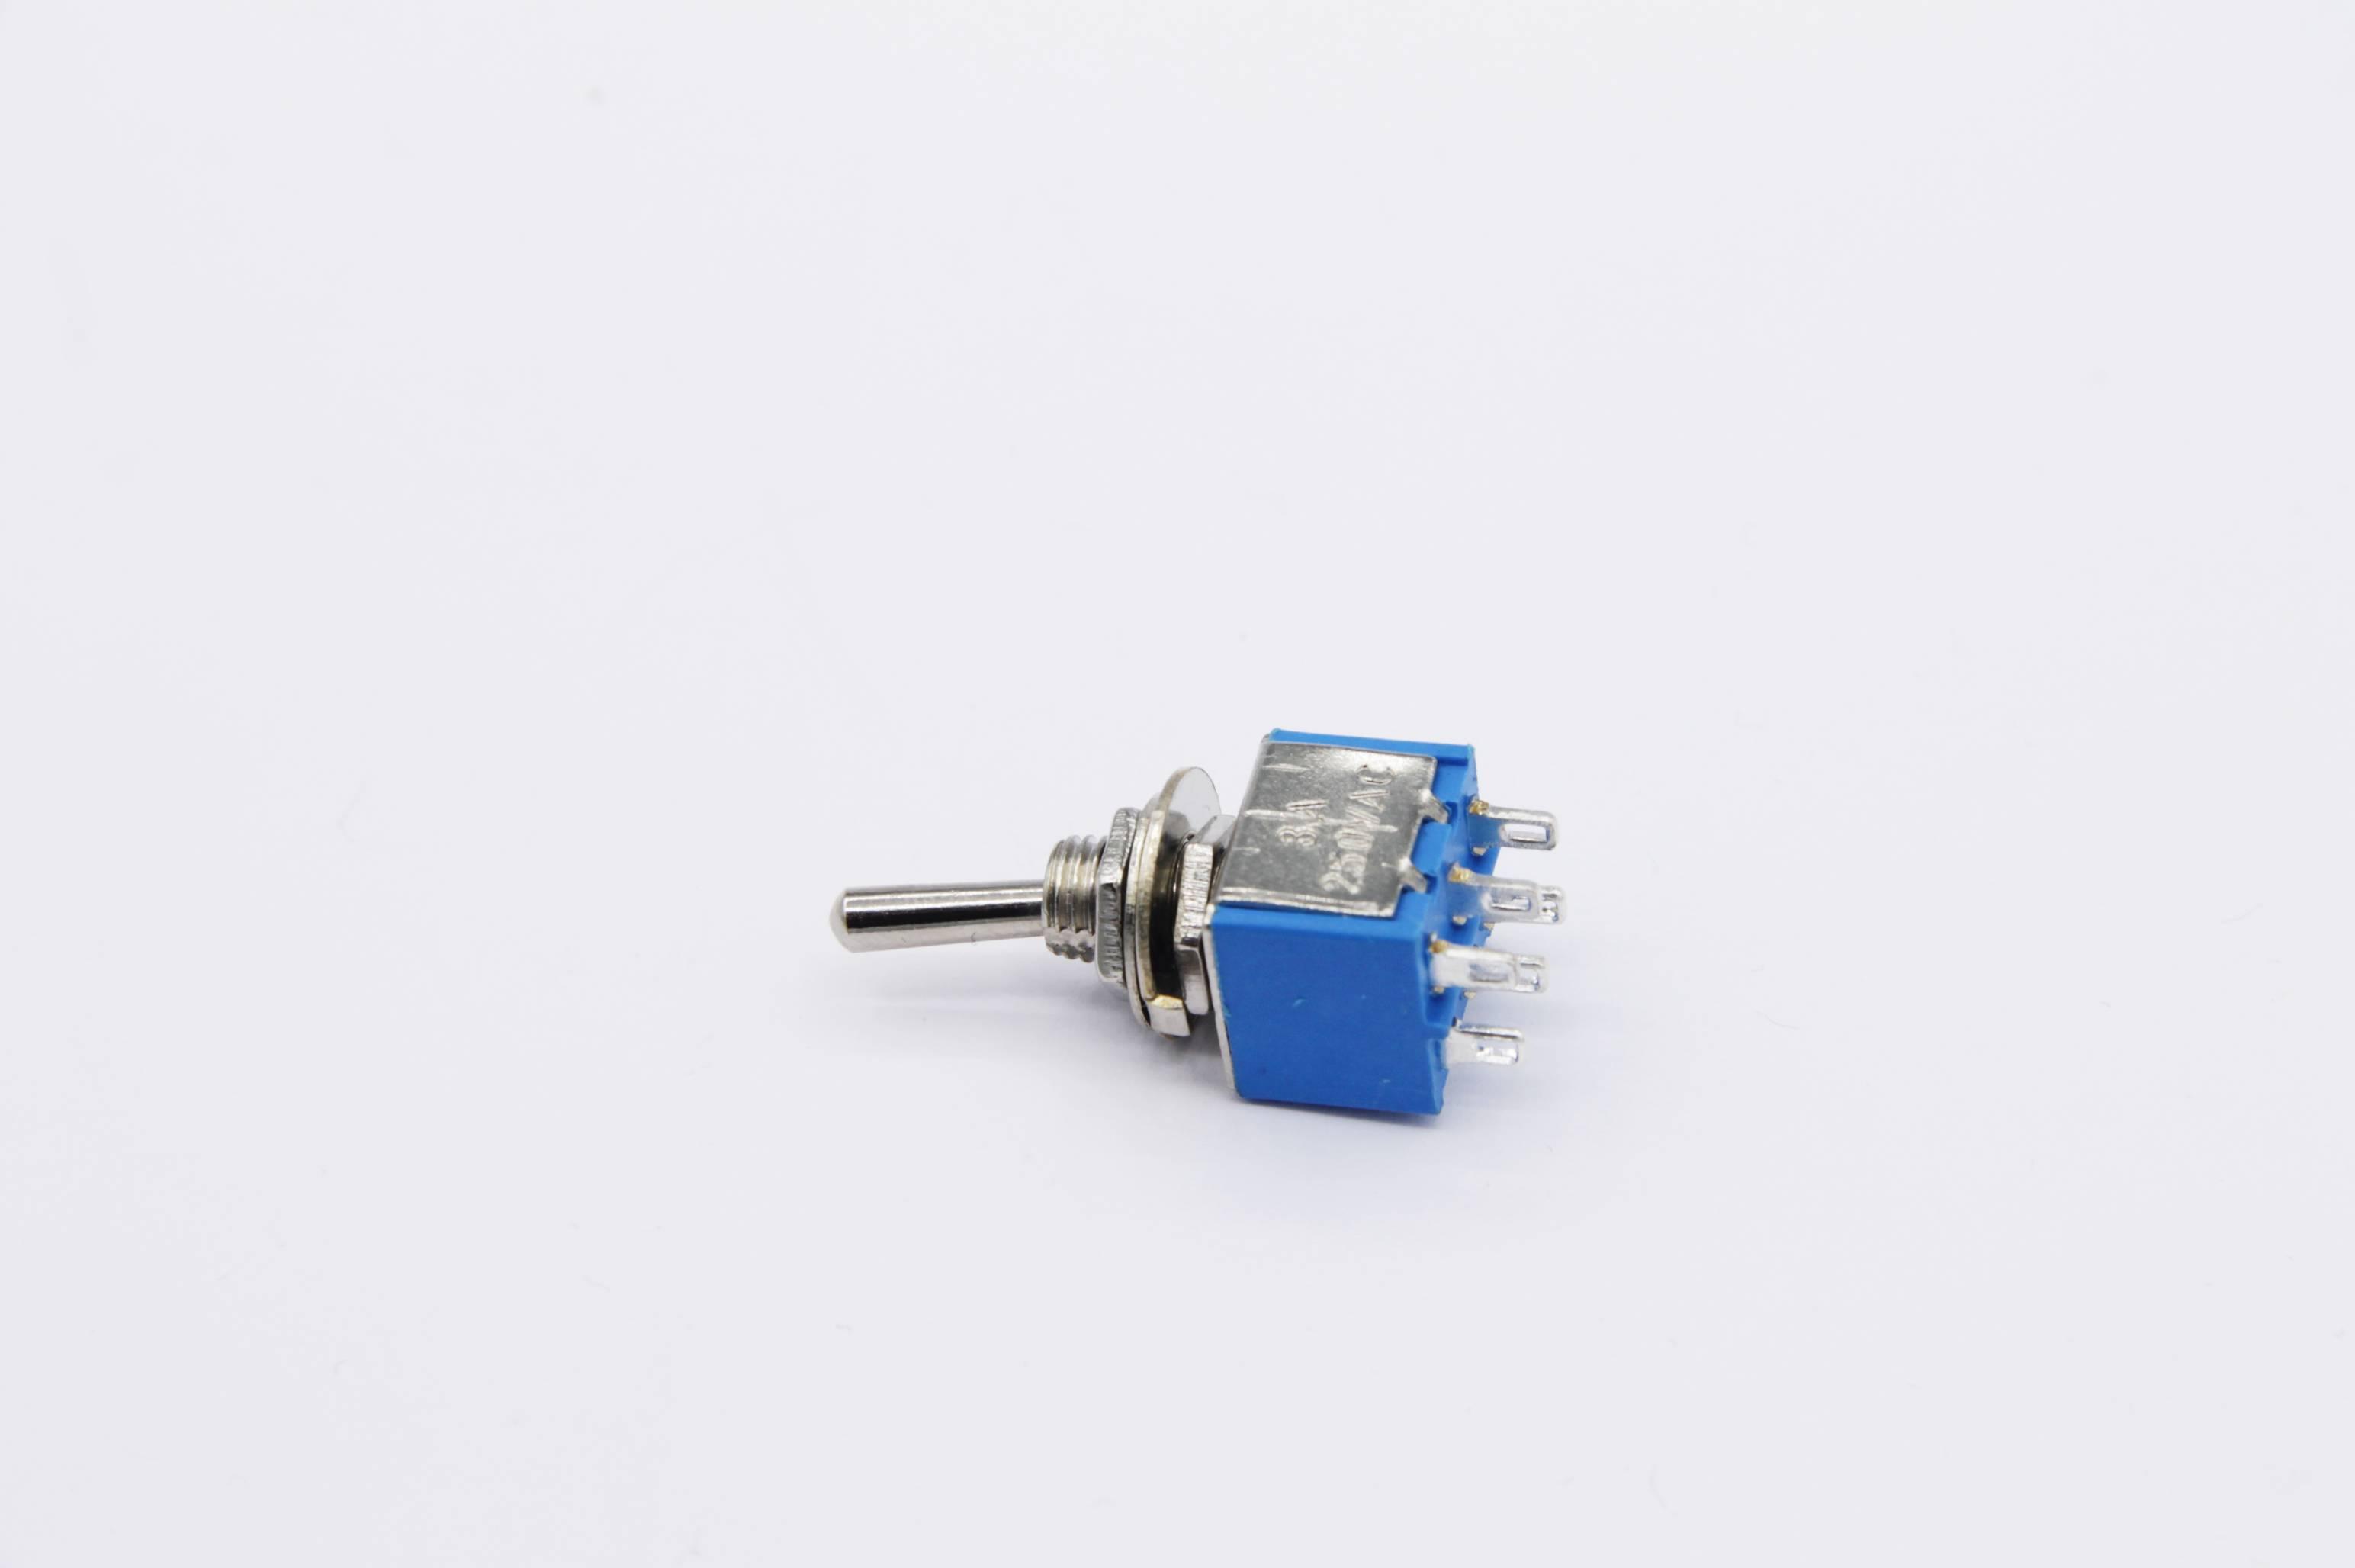 Miniatur Kippschalter 2x UM - 2 Schaltstellungen 2-polig (6 Pin) blau